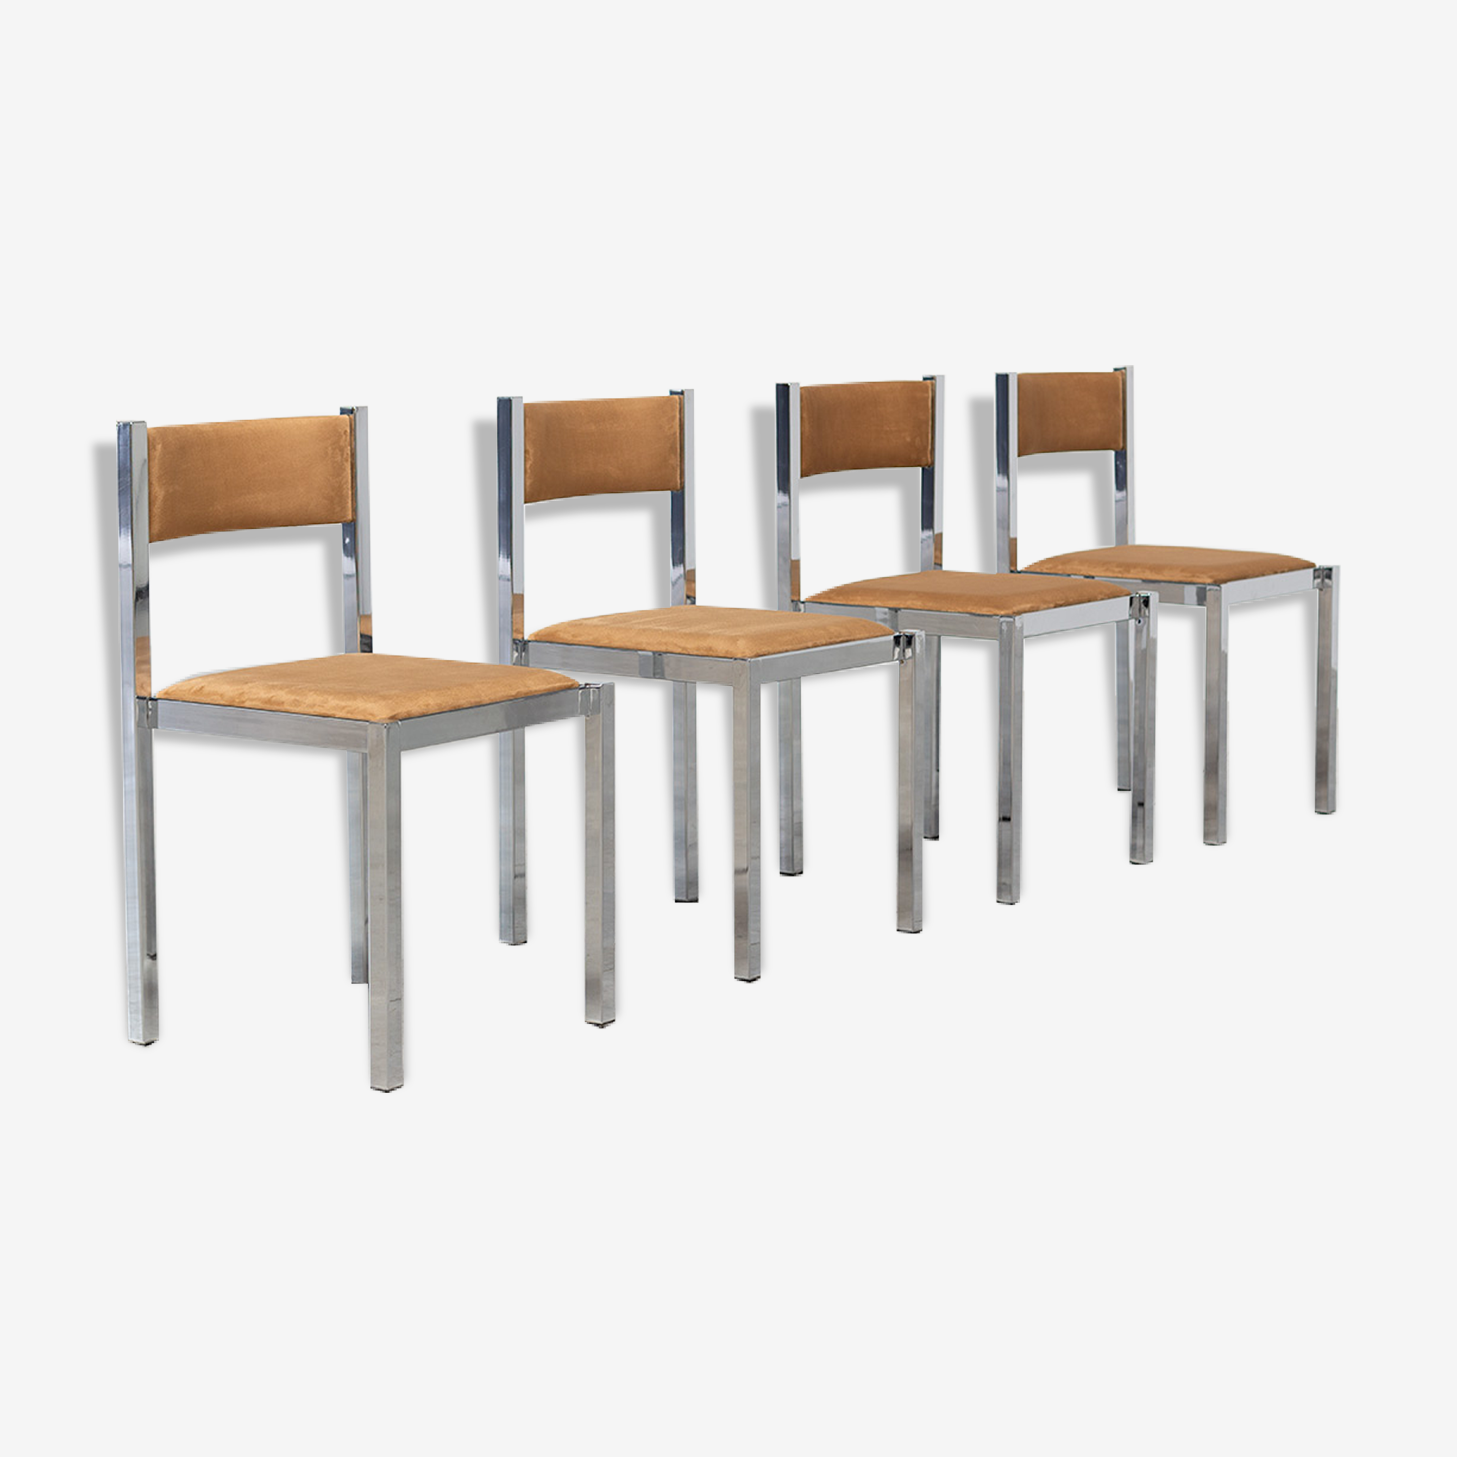 Quatre chaises chrome cubistes Cidue Italie design 1970